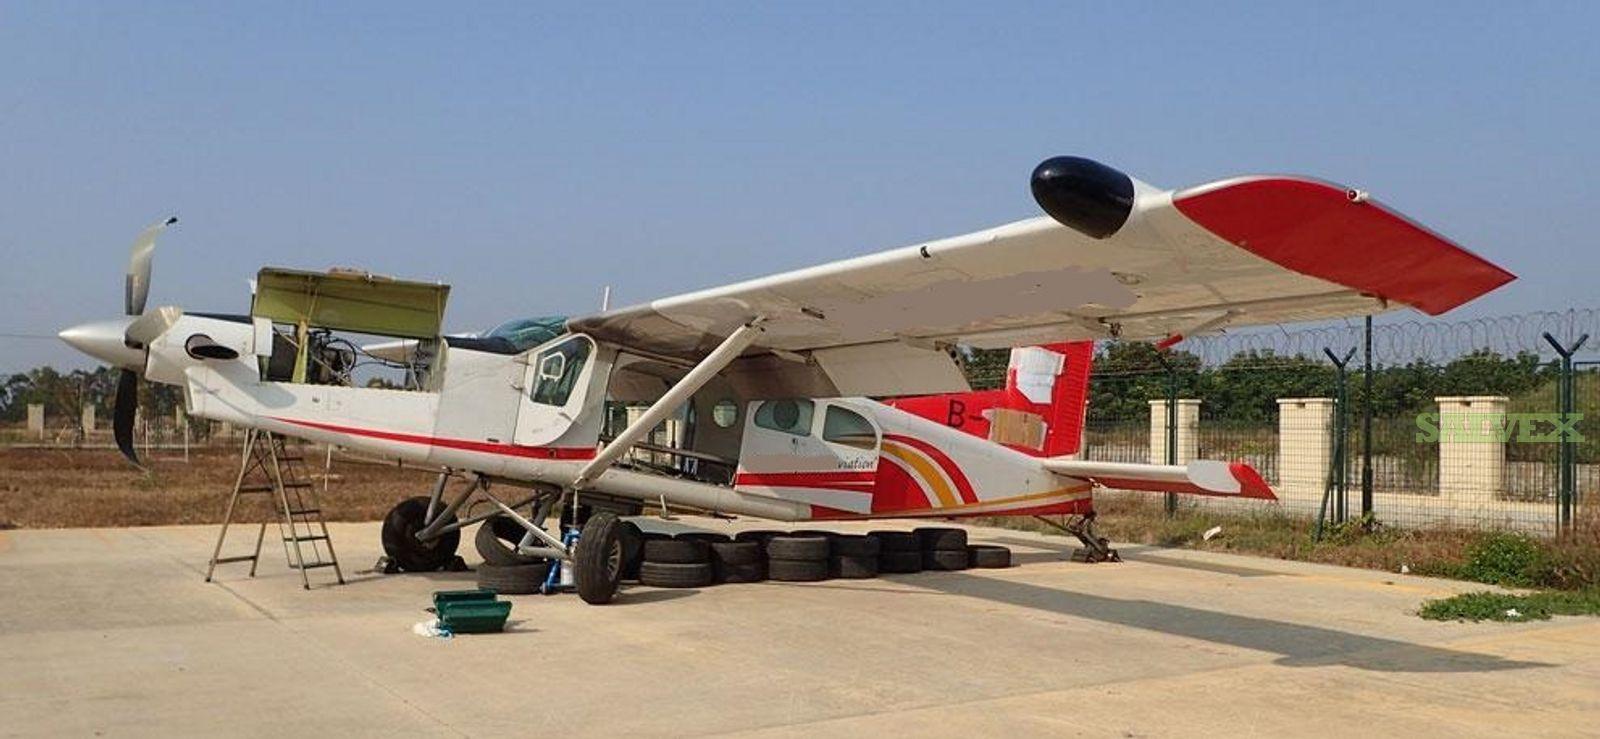 Pilatus PC-6 B2-H4 Aircraft 2015 (1 Unit)